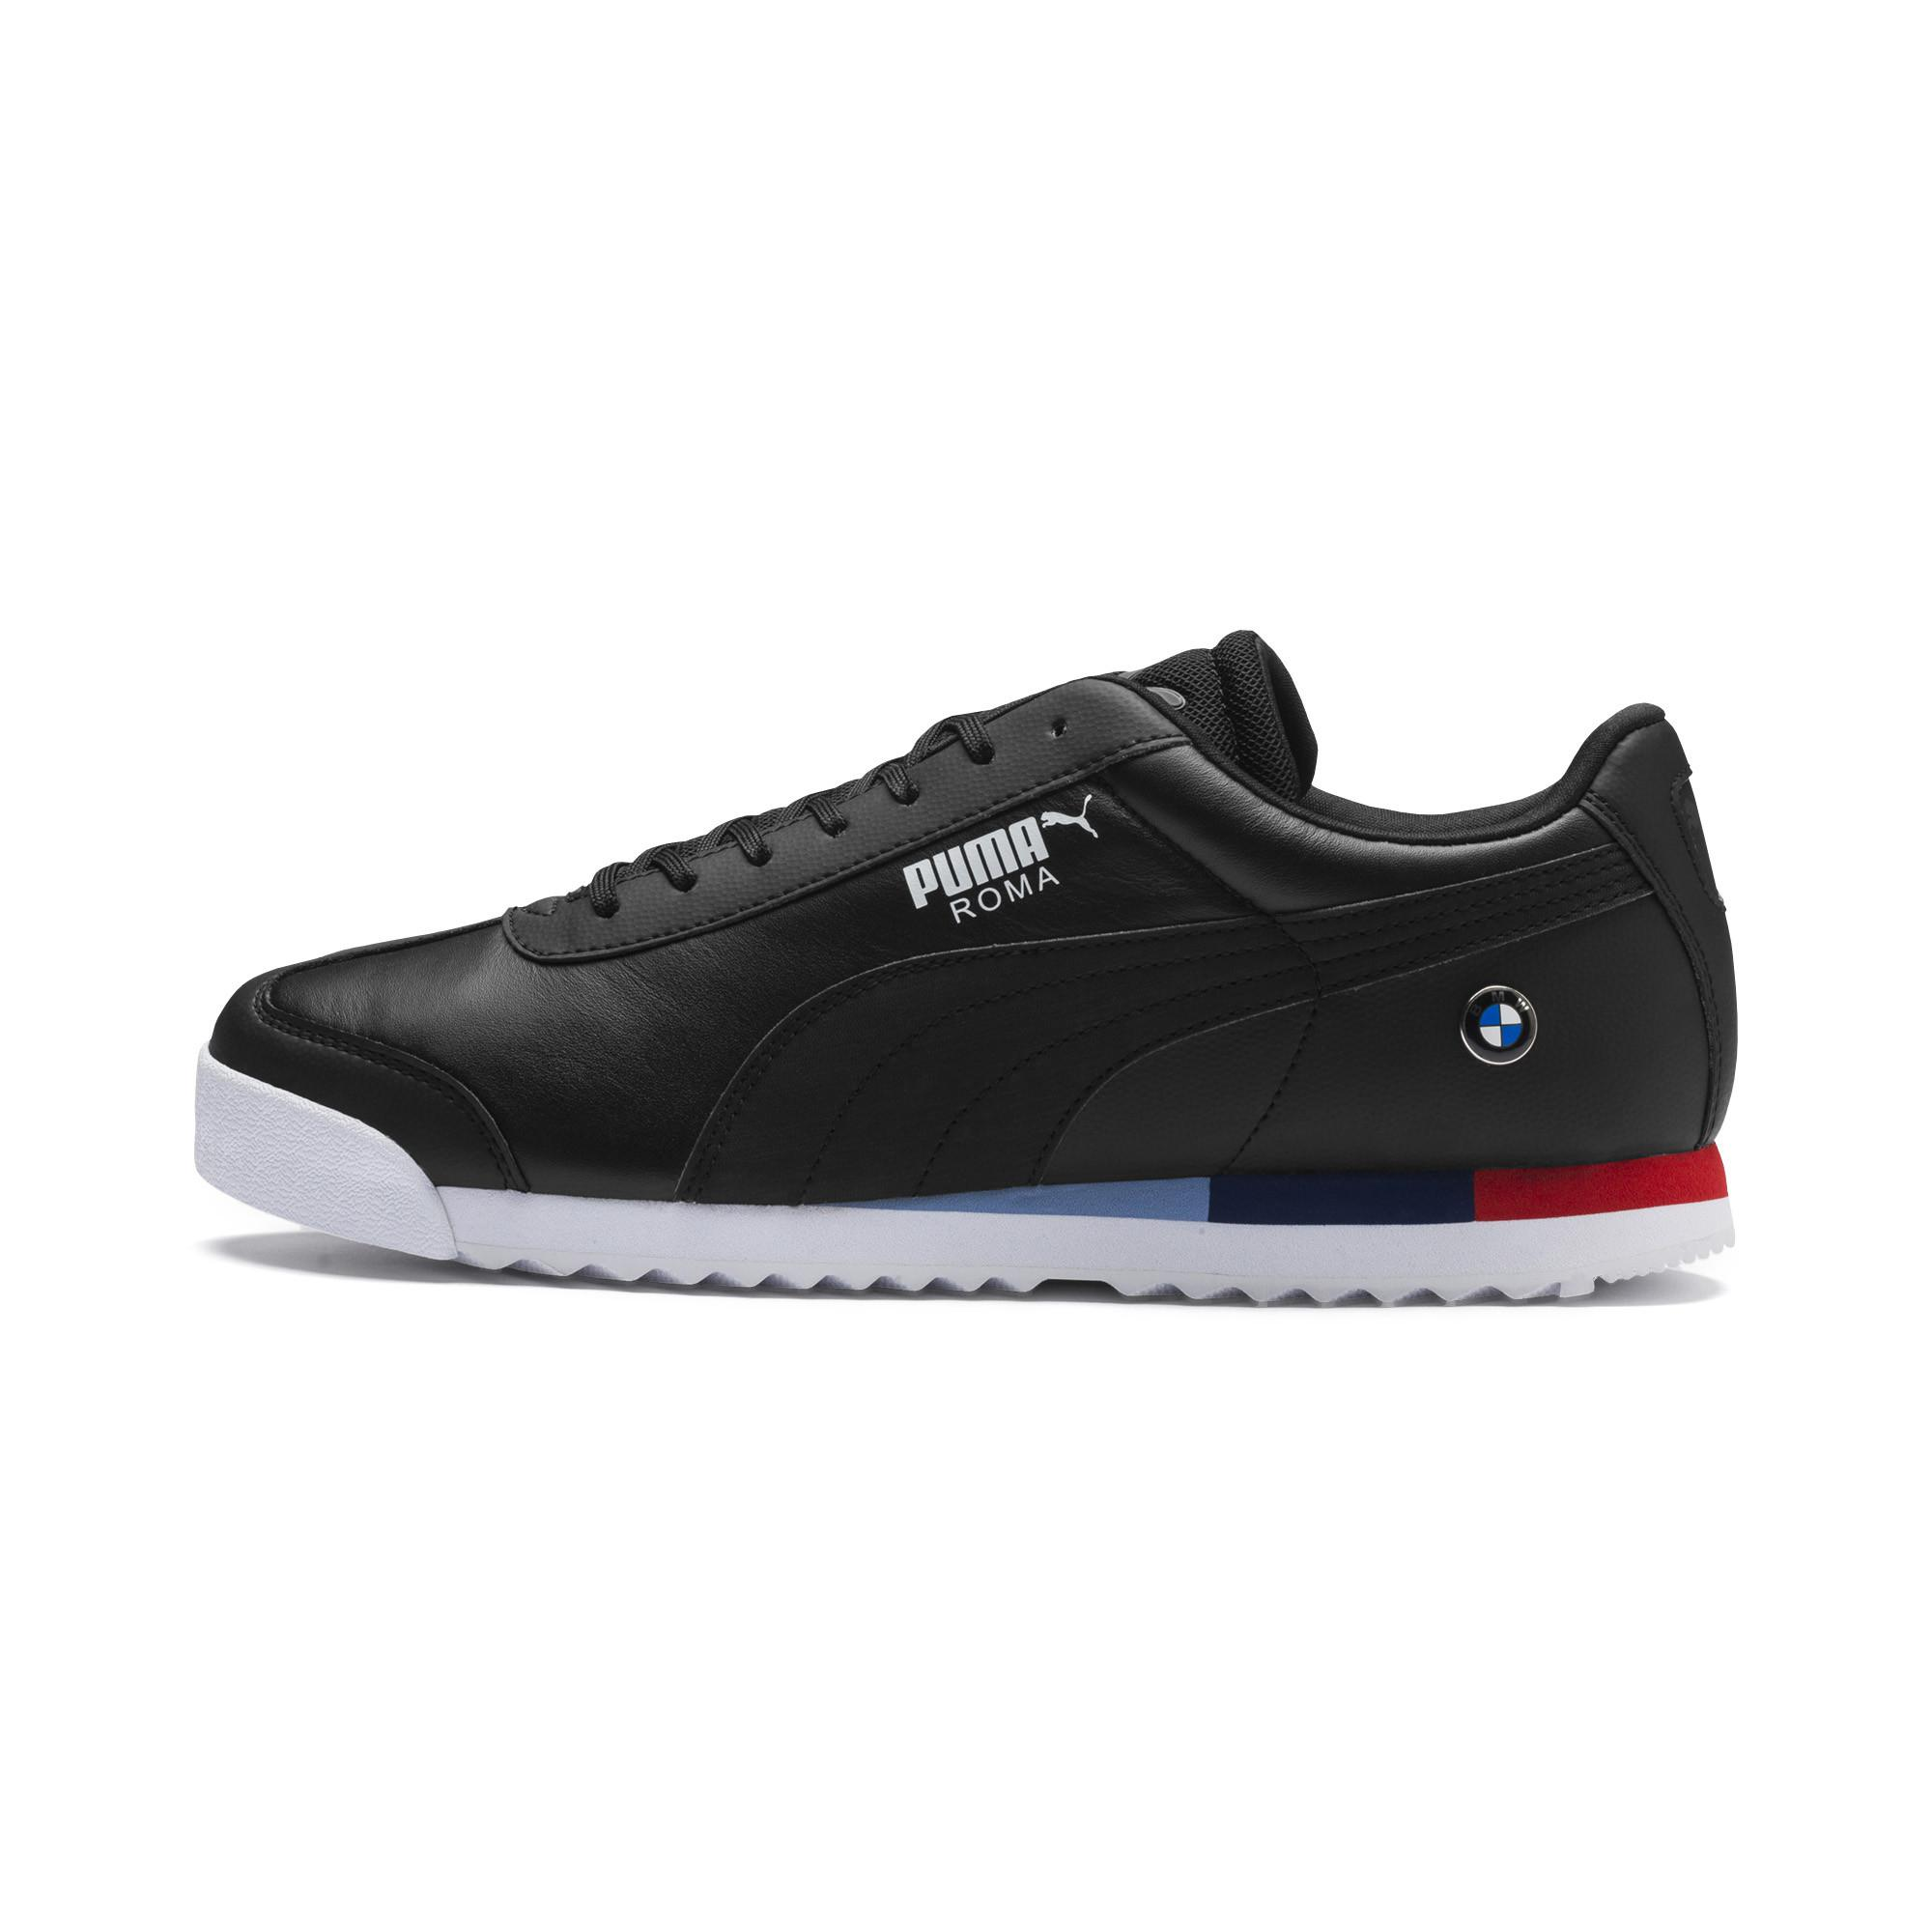 8b728130498b09 Lyst - PUMA Bmw Mms Roma  s Sneakers in Black for Men